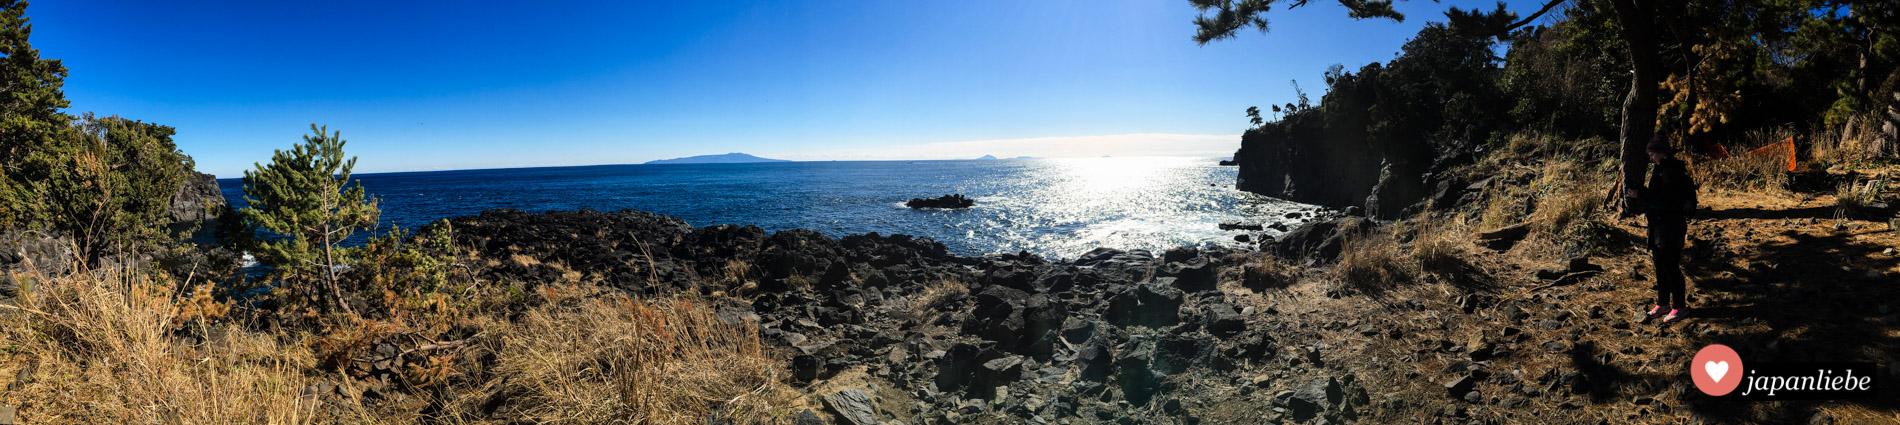 Traumhaftes Panorama.